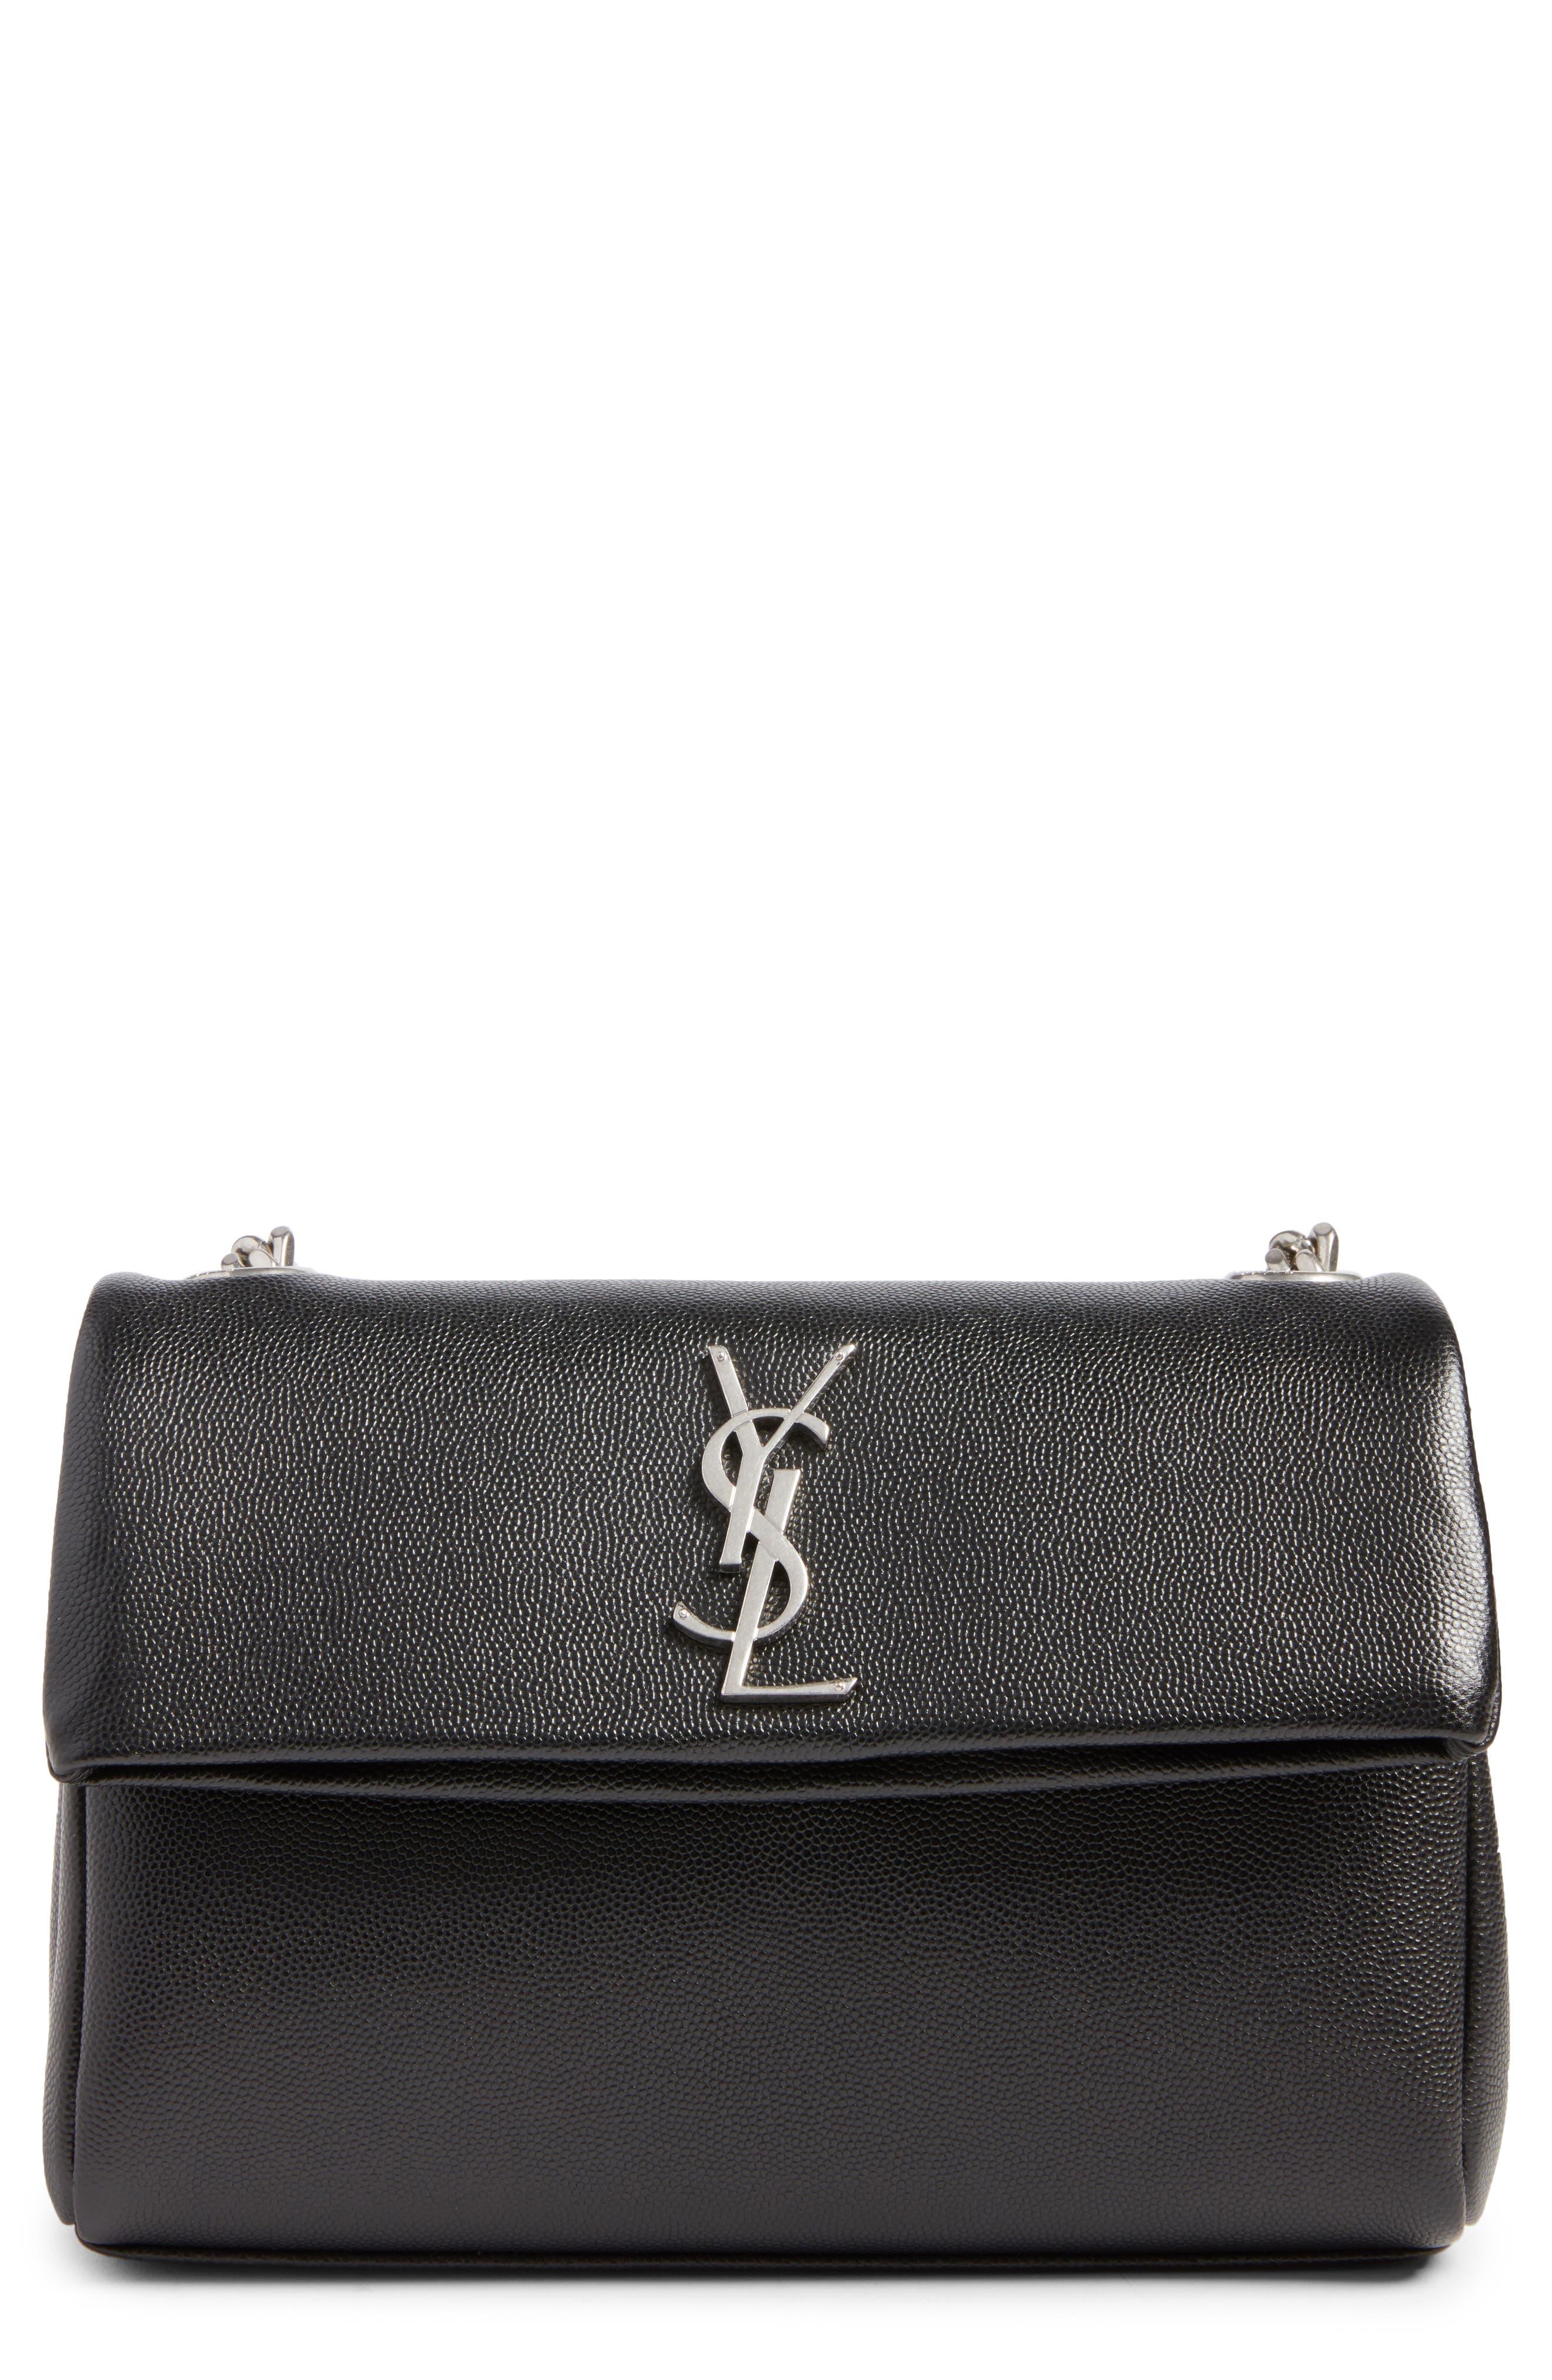 West Hollywood Calfskin Leather Messenger Bag,                             Main thumbnail 2, color,